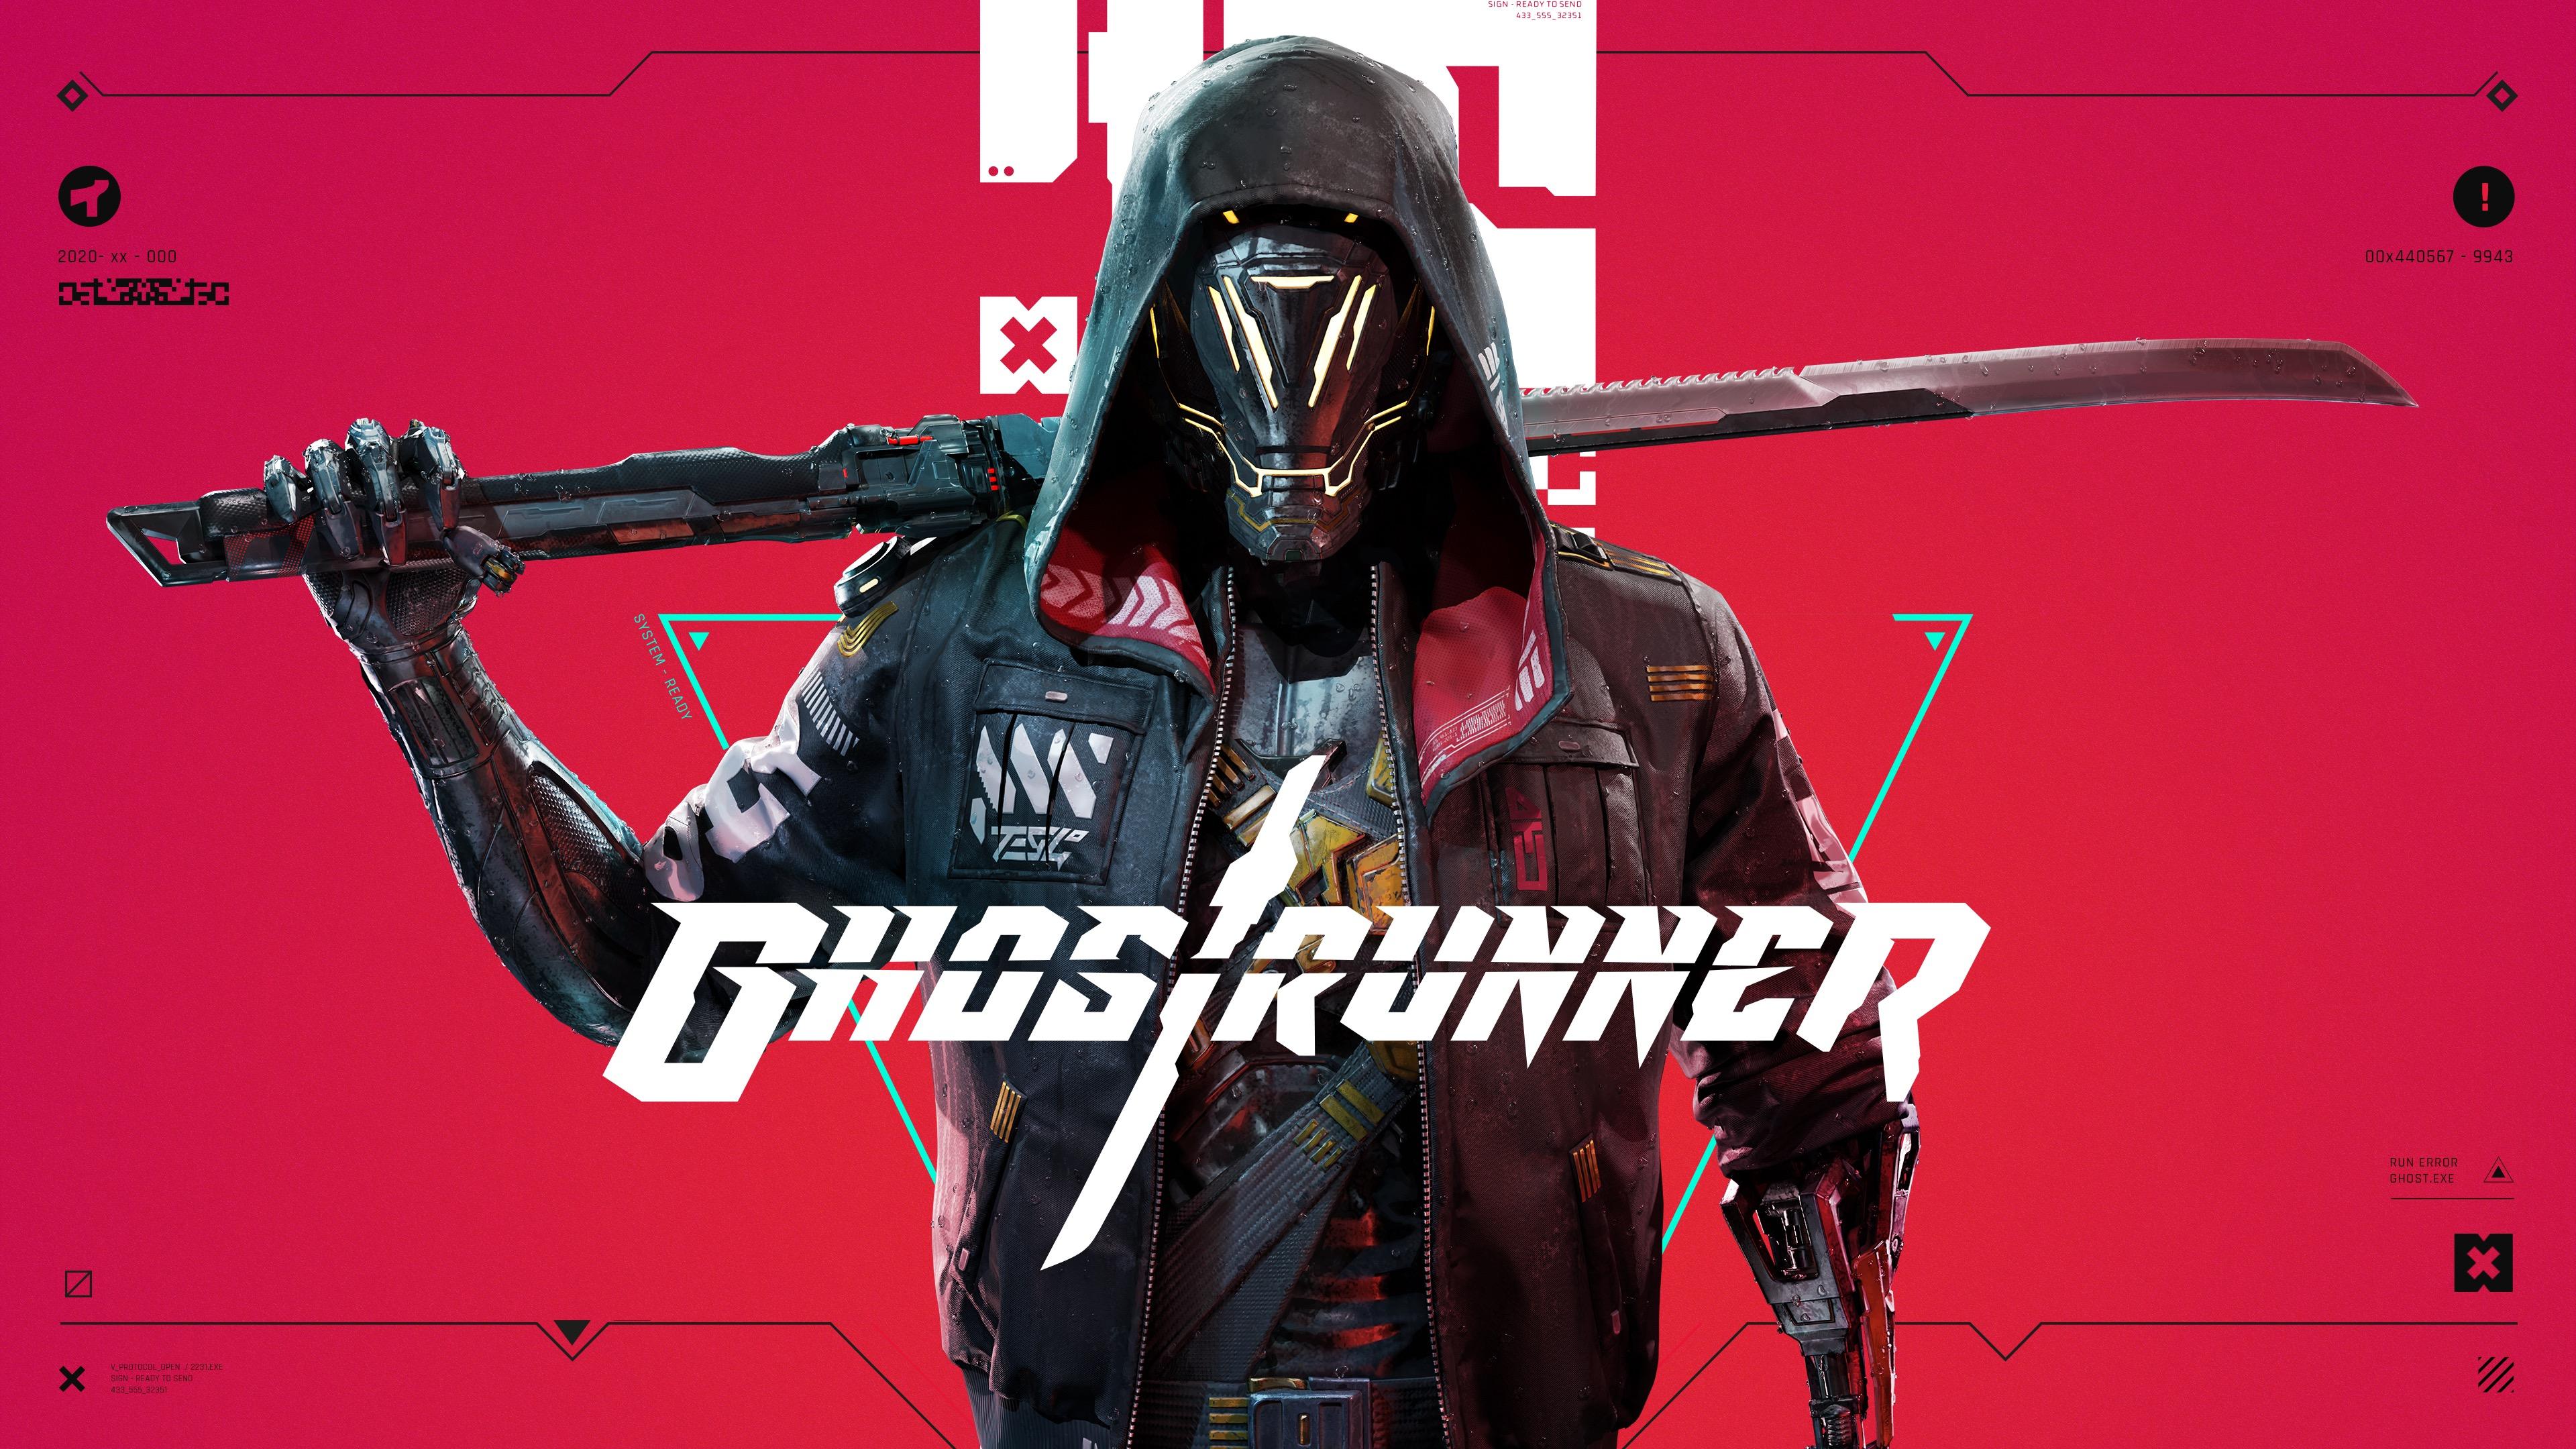 0916-ghostrunner-15